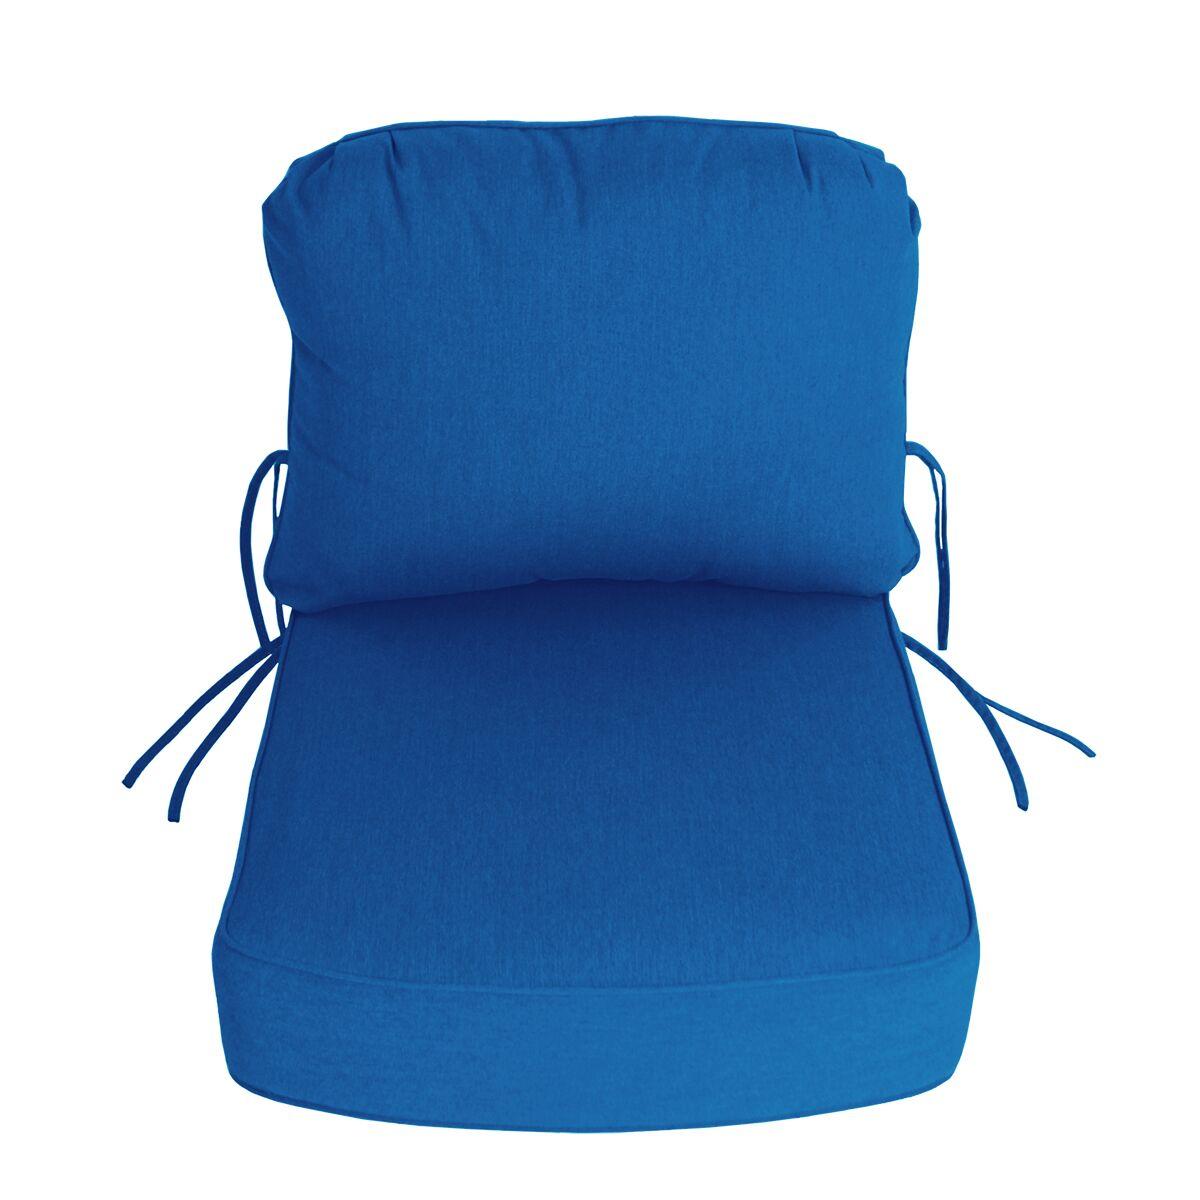 Indoor/Outdoor Sunbrella Deep Setting Chair Cushion Fabric: Pacific Blue